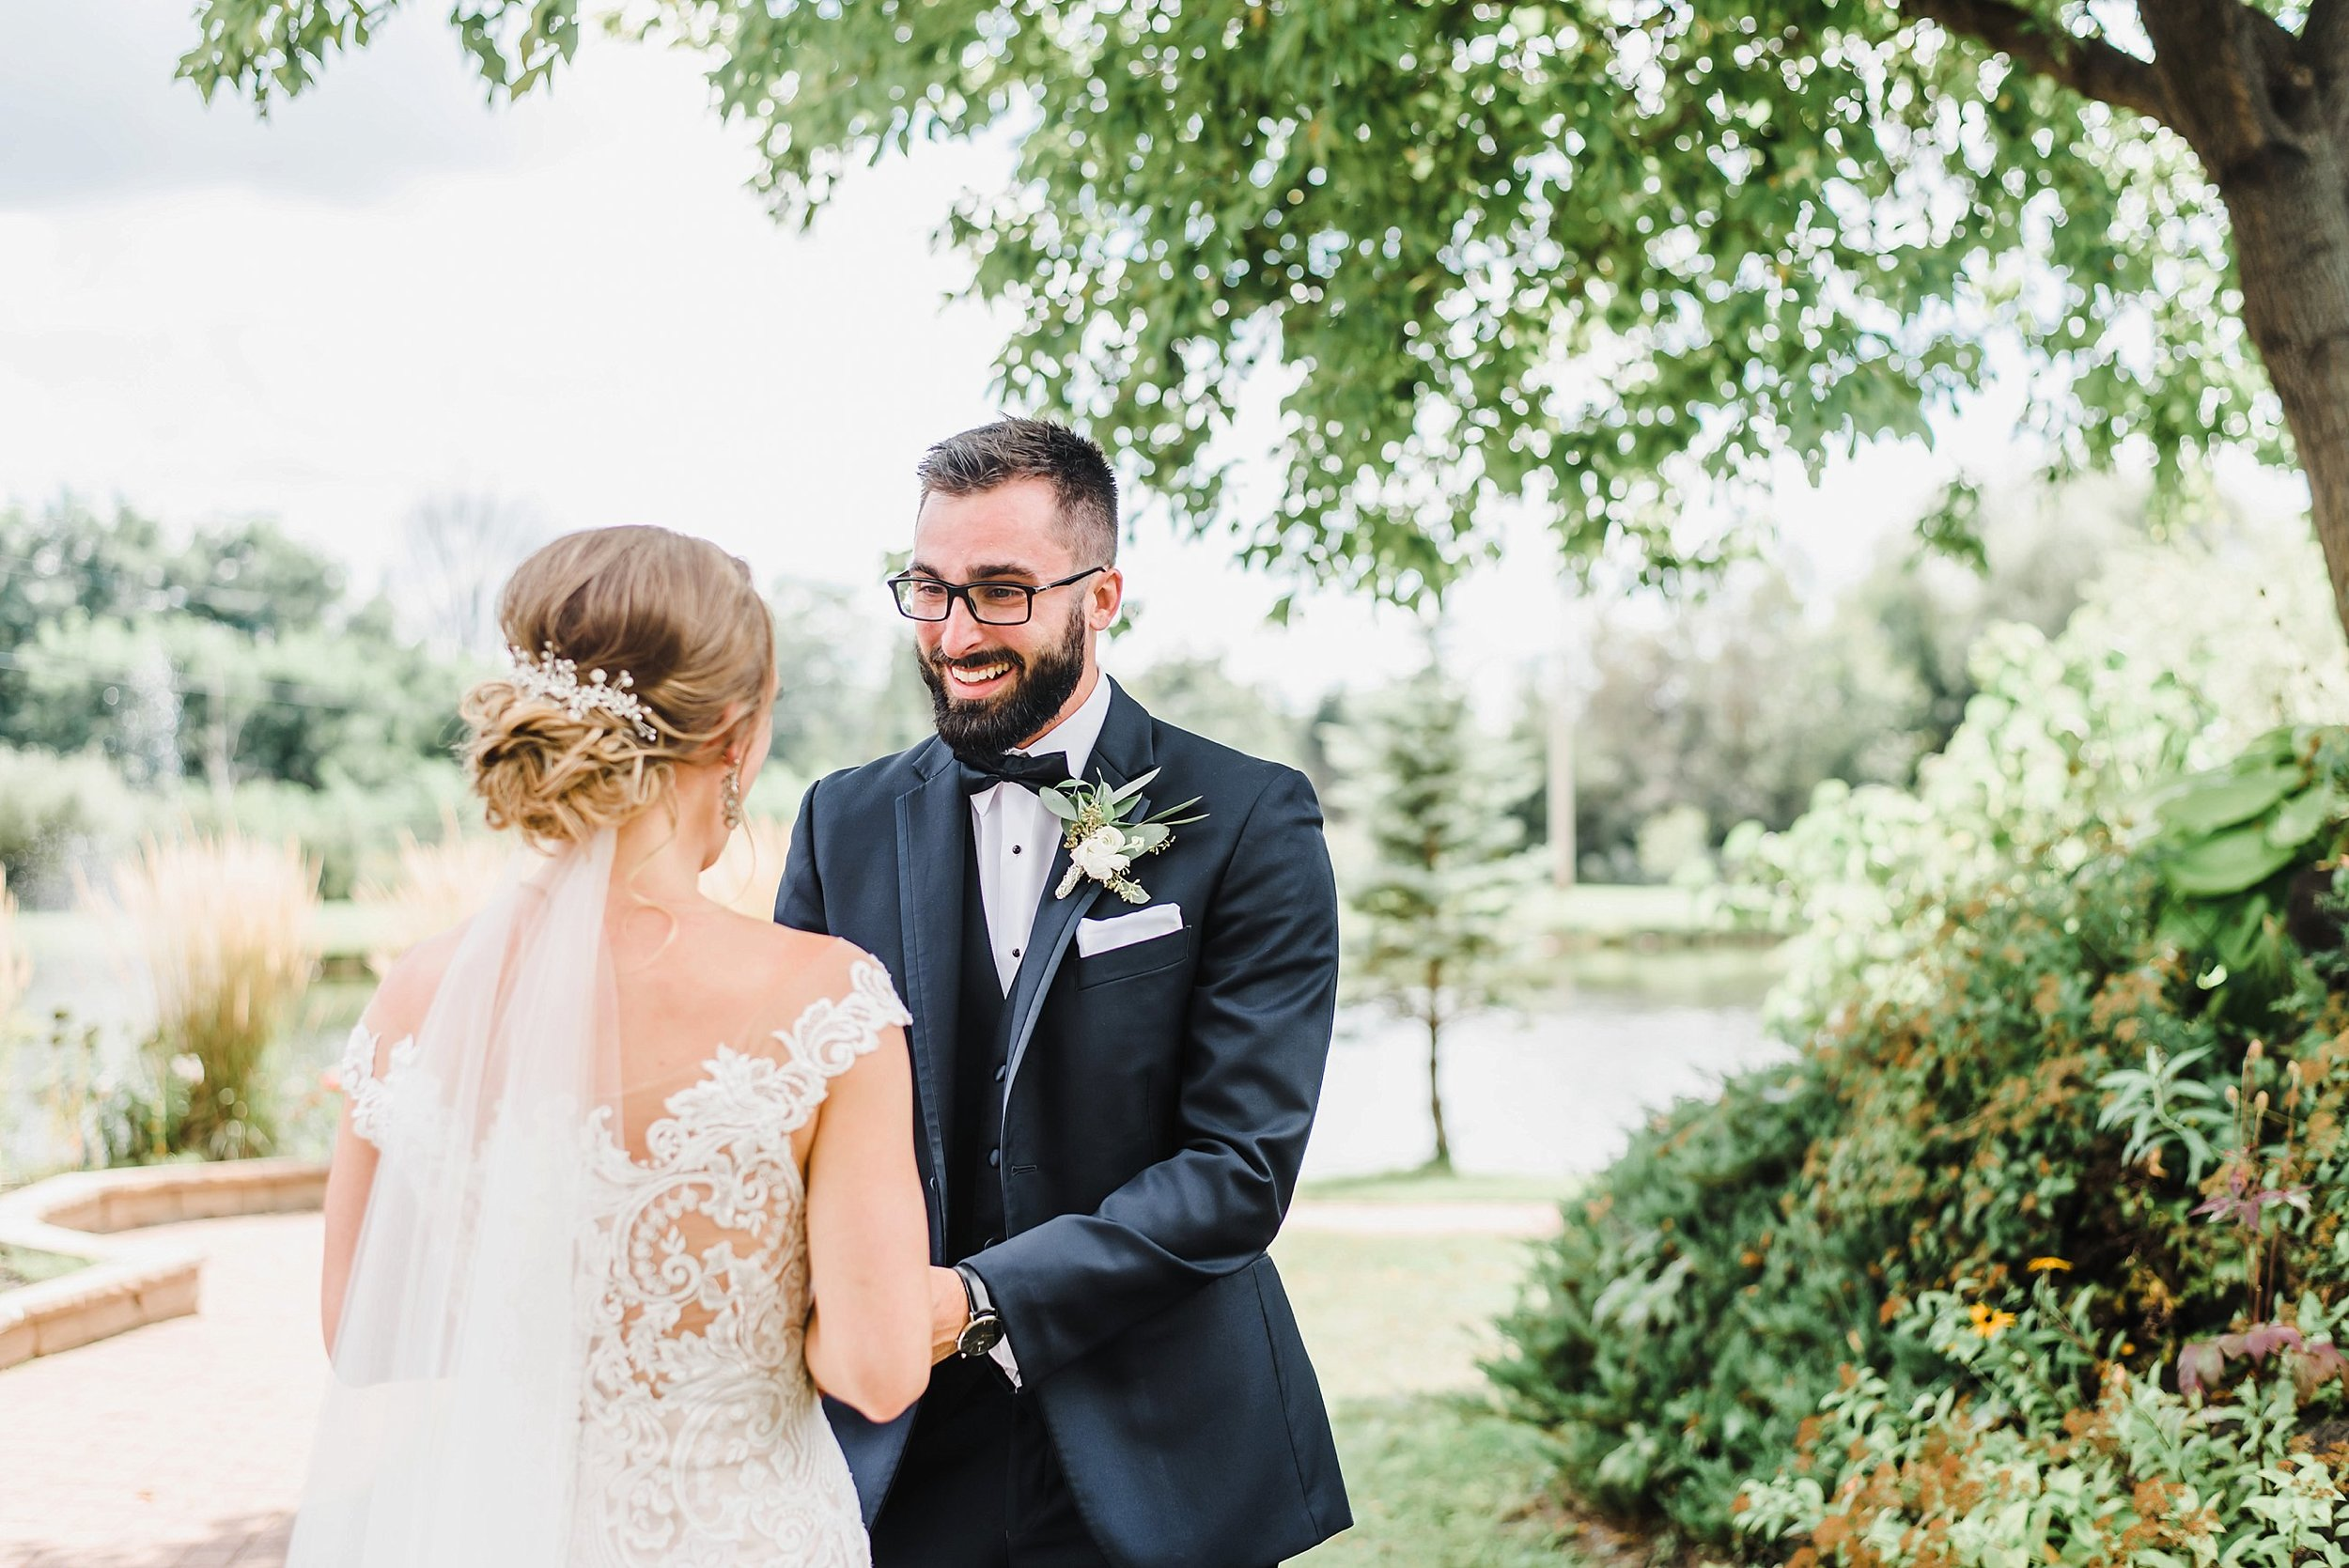 light airy indie fine art ottawa wedding photographer | Ali and Batoul Photography_1244.jpg